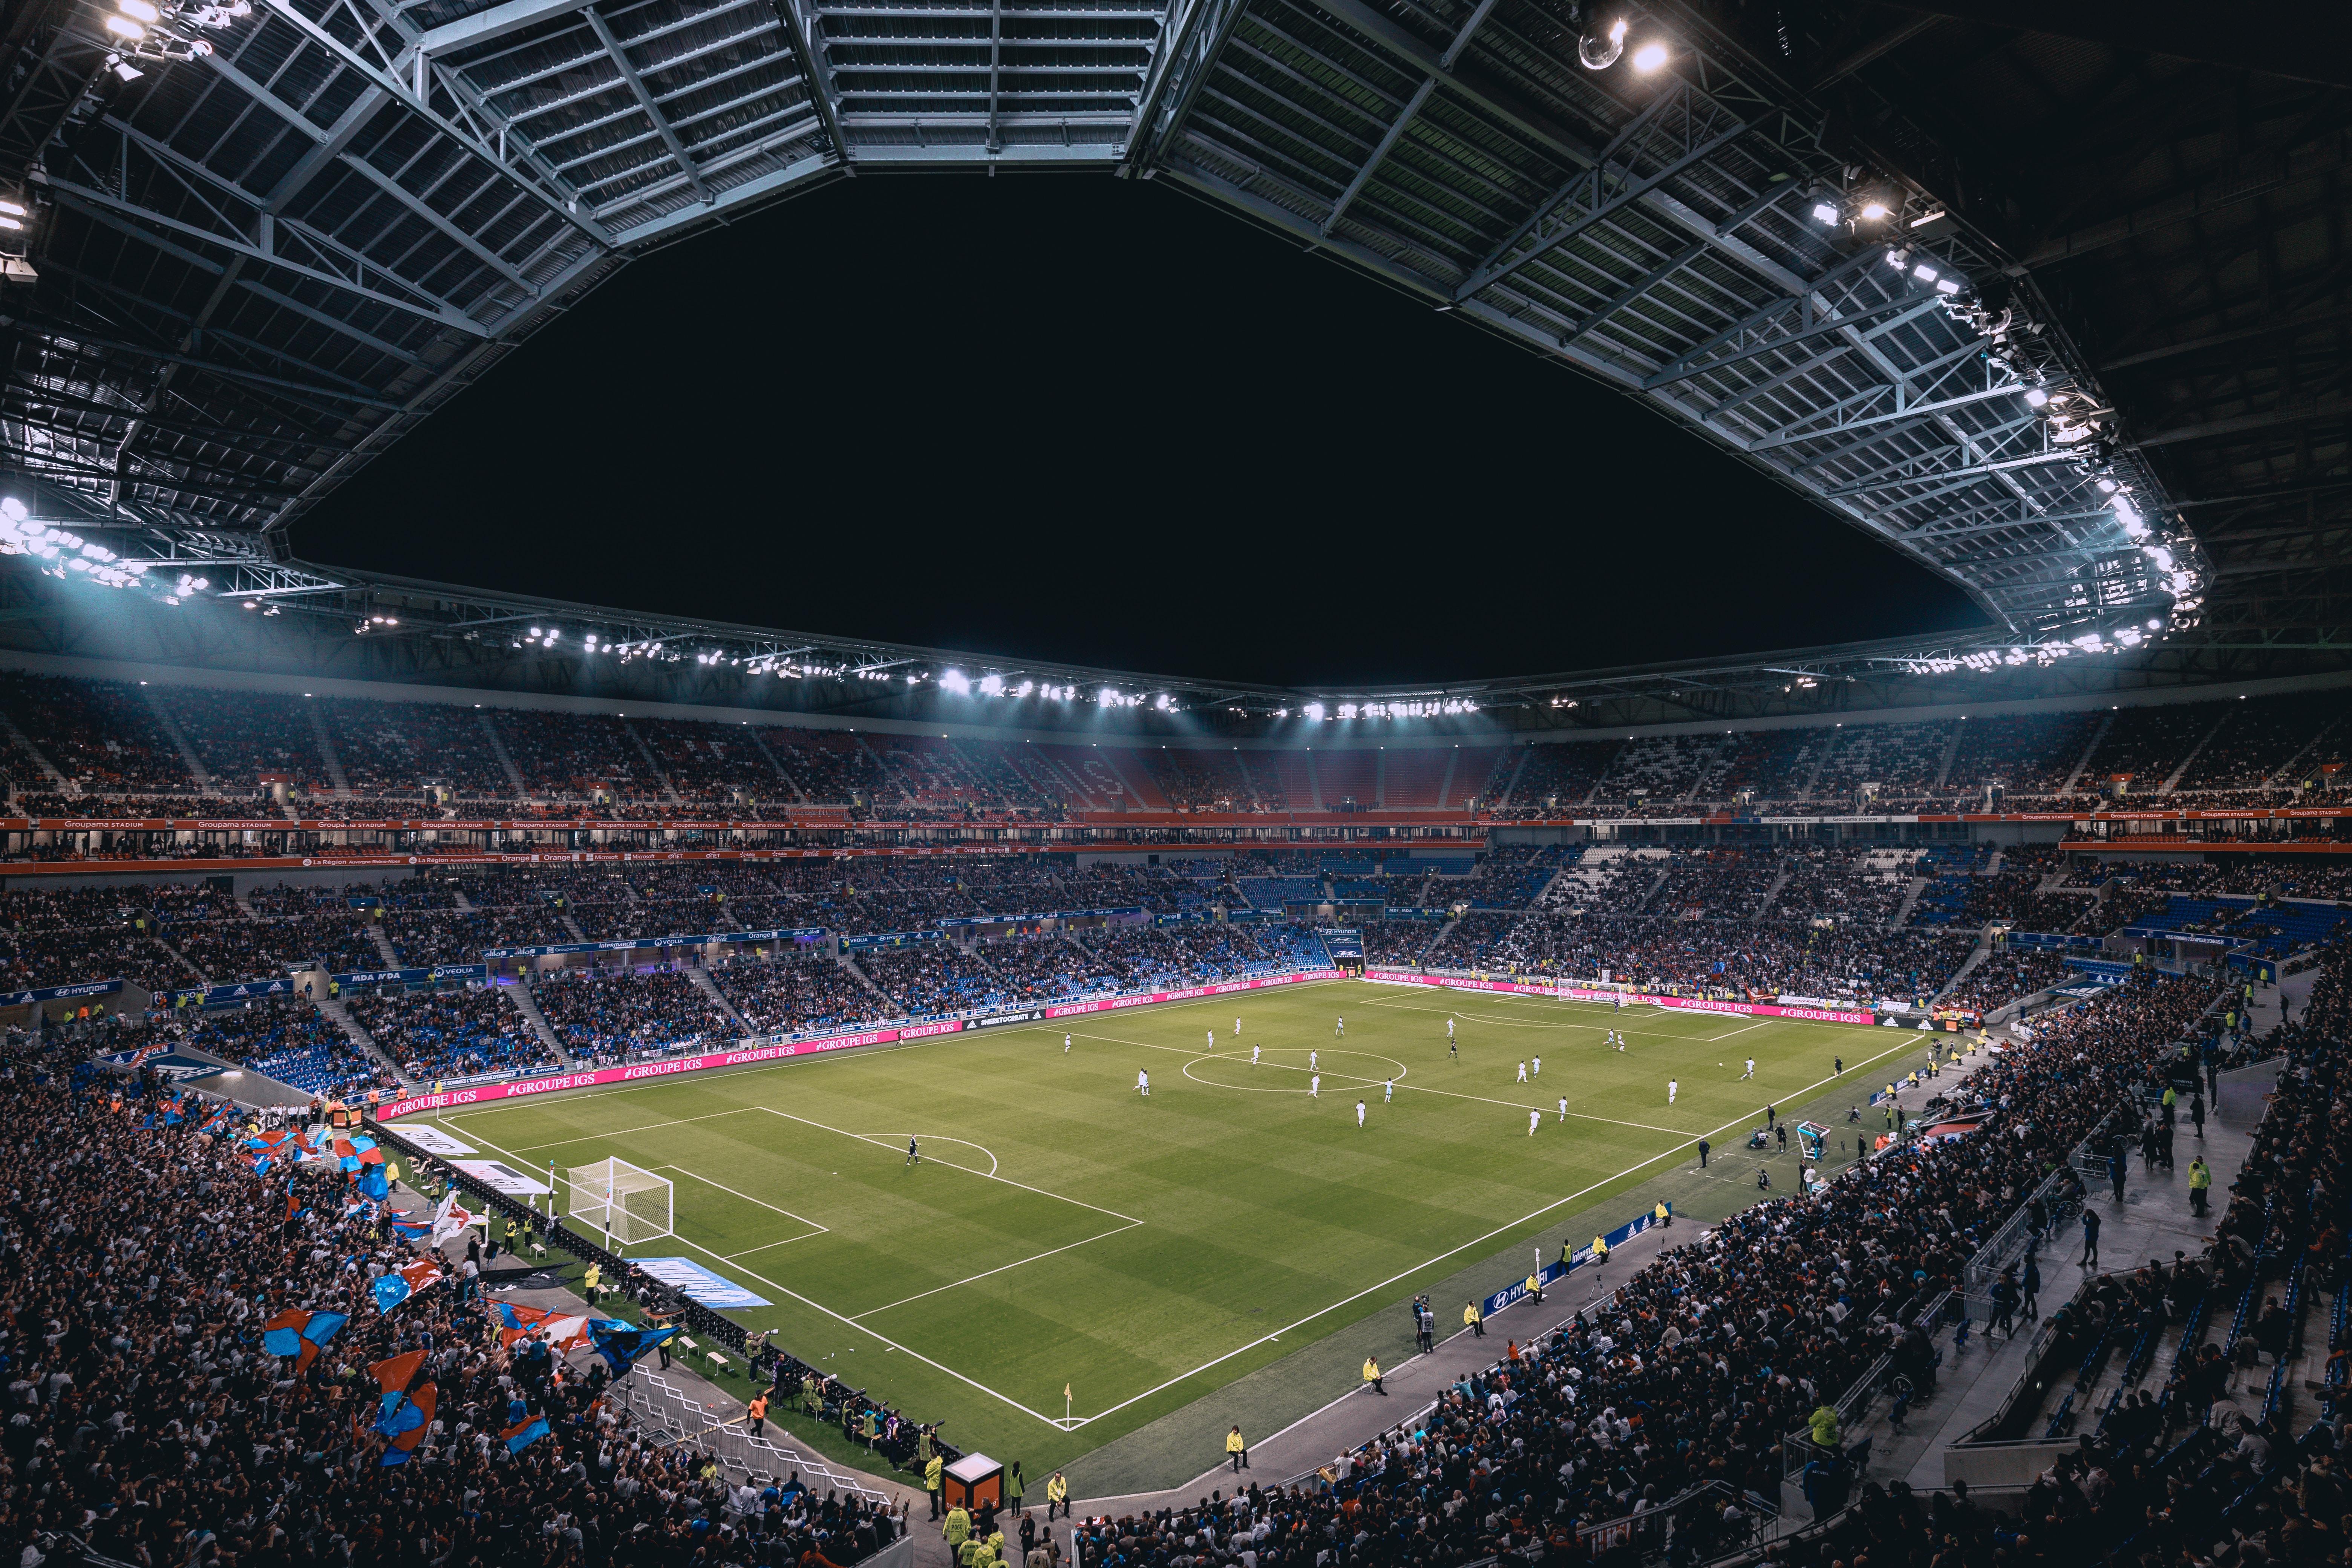 Full football stadium